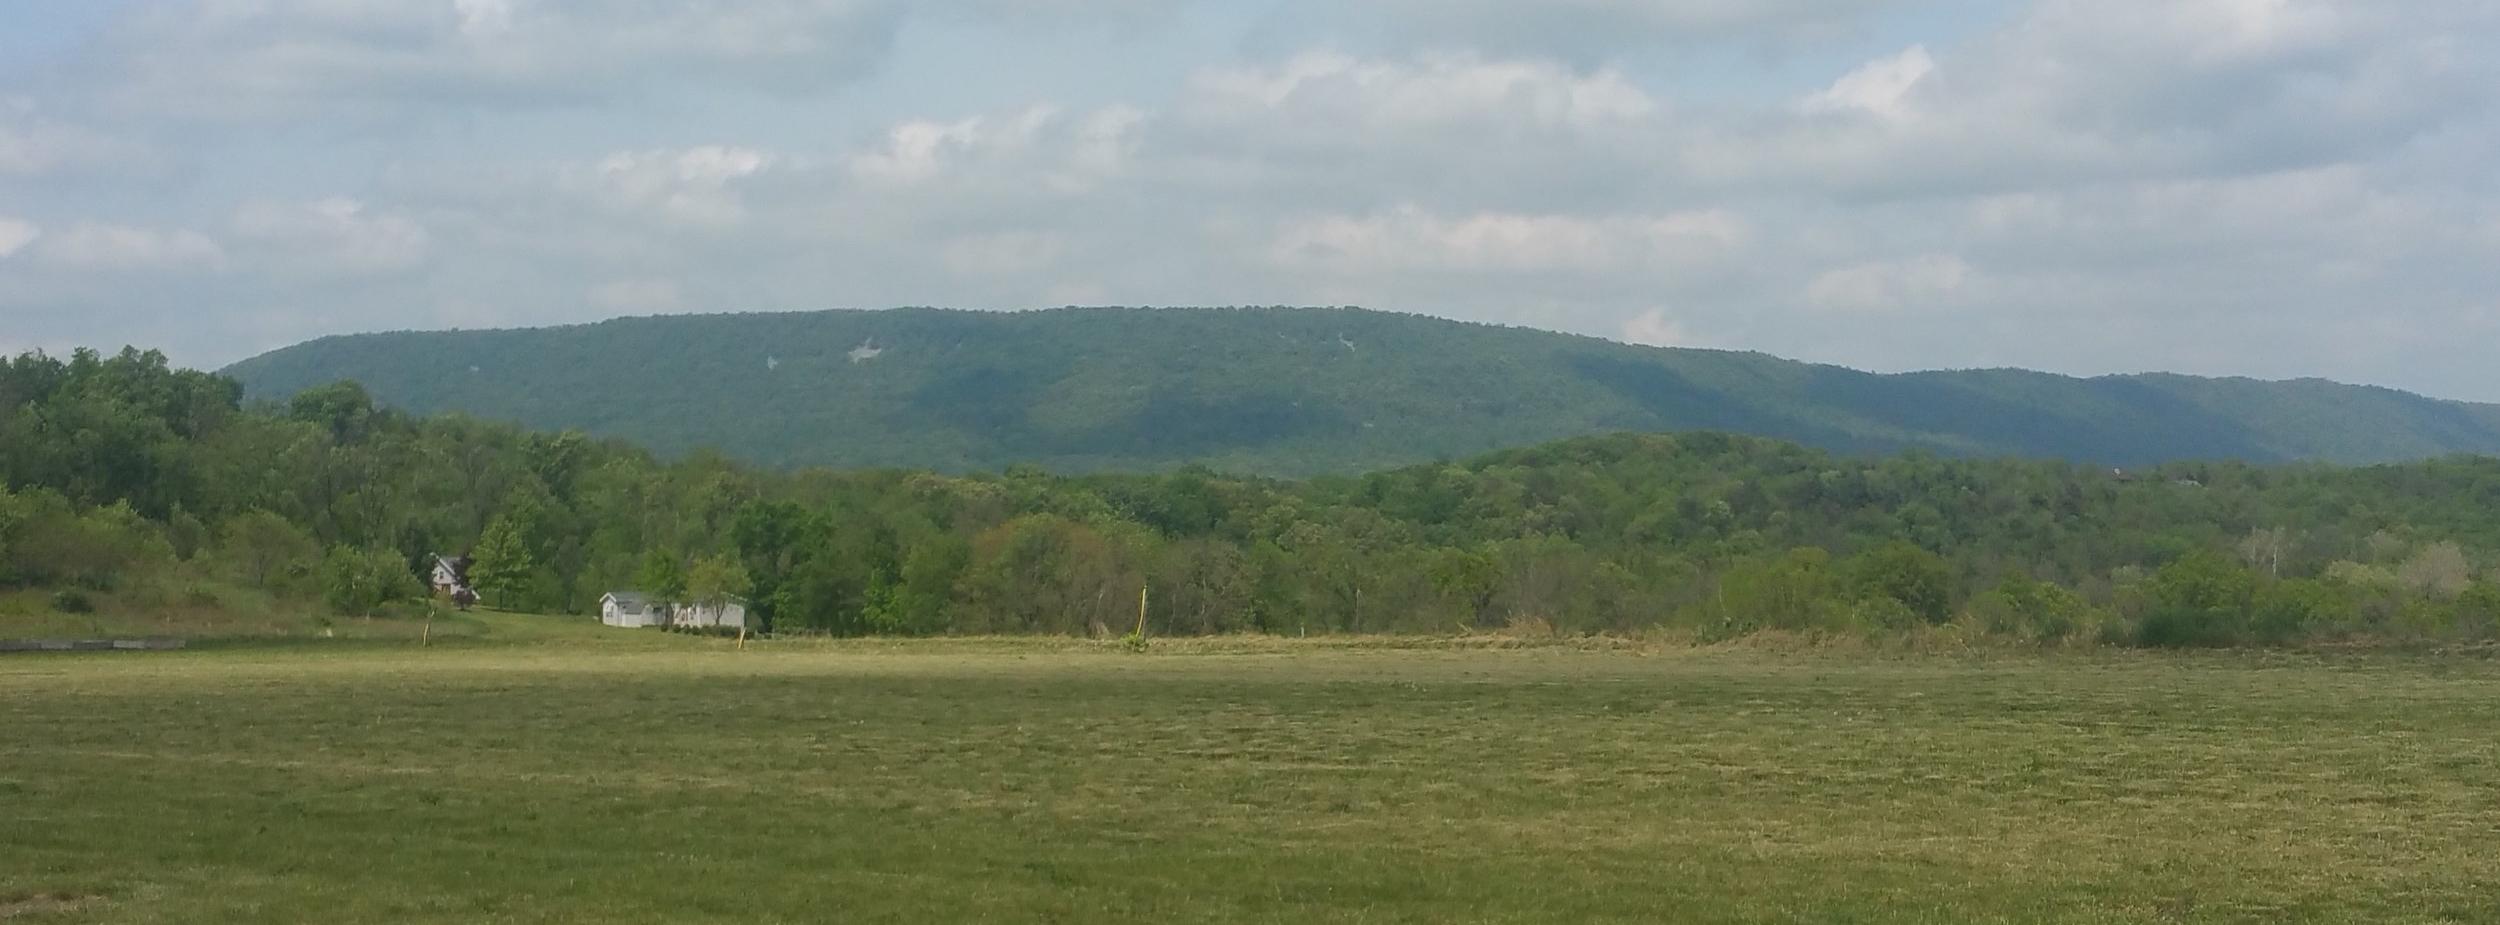 Backdrop of Blue Mountain Range